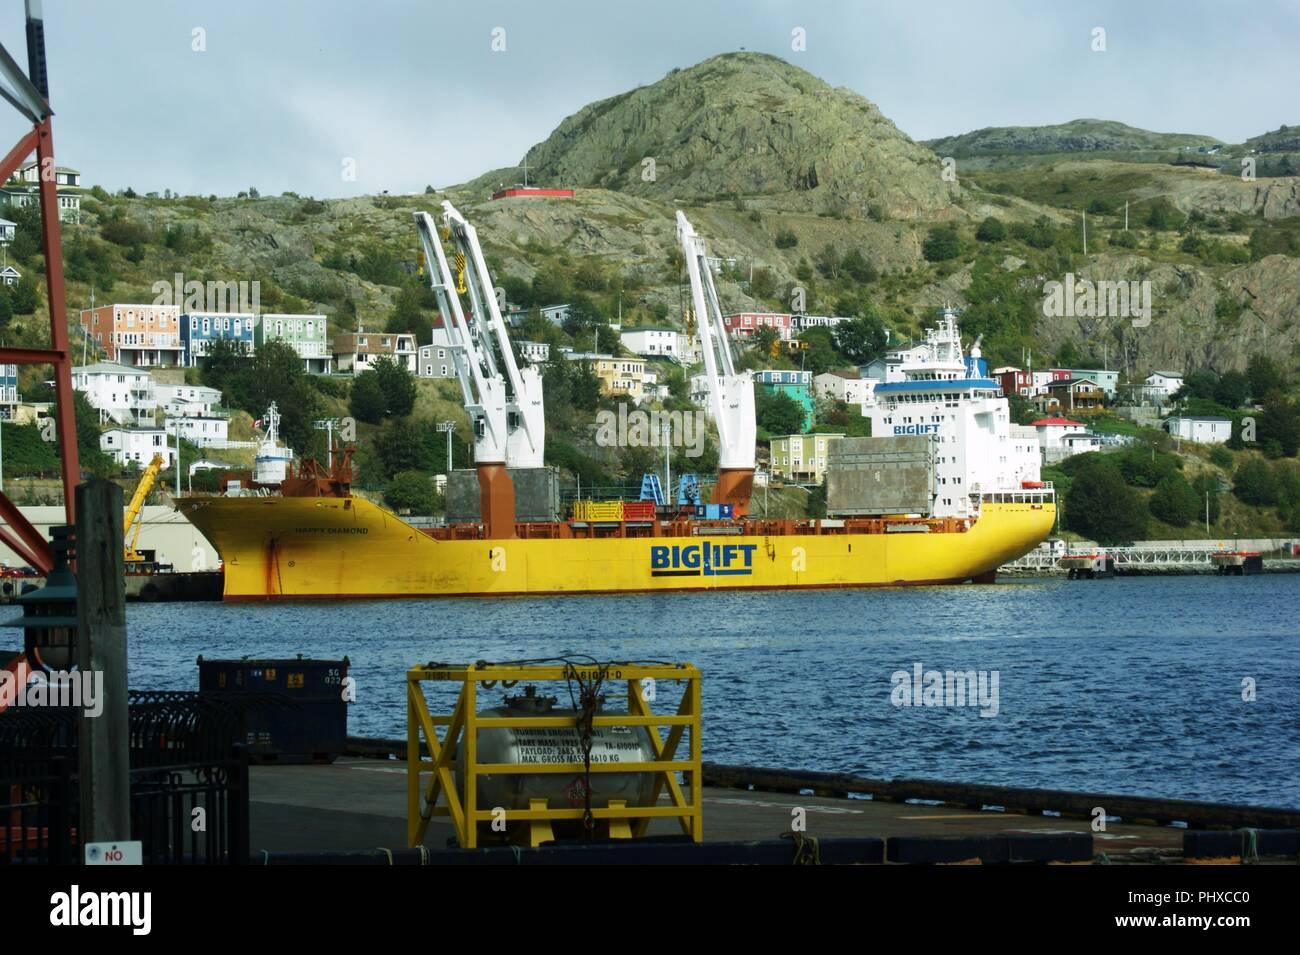 Big Lift's Heavy lift Ship Happy Diamond unloads at St. Johns, Newfoundland - Stock Image